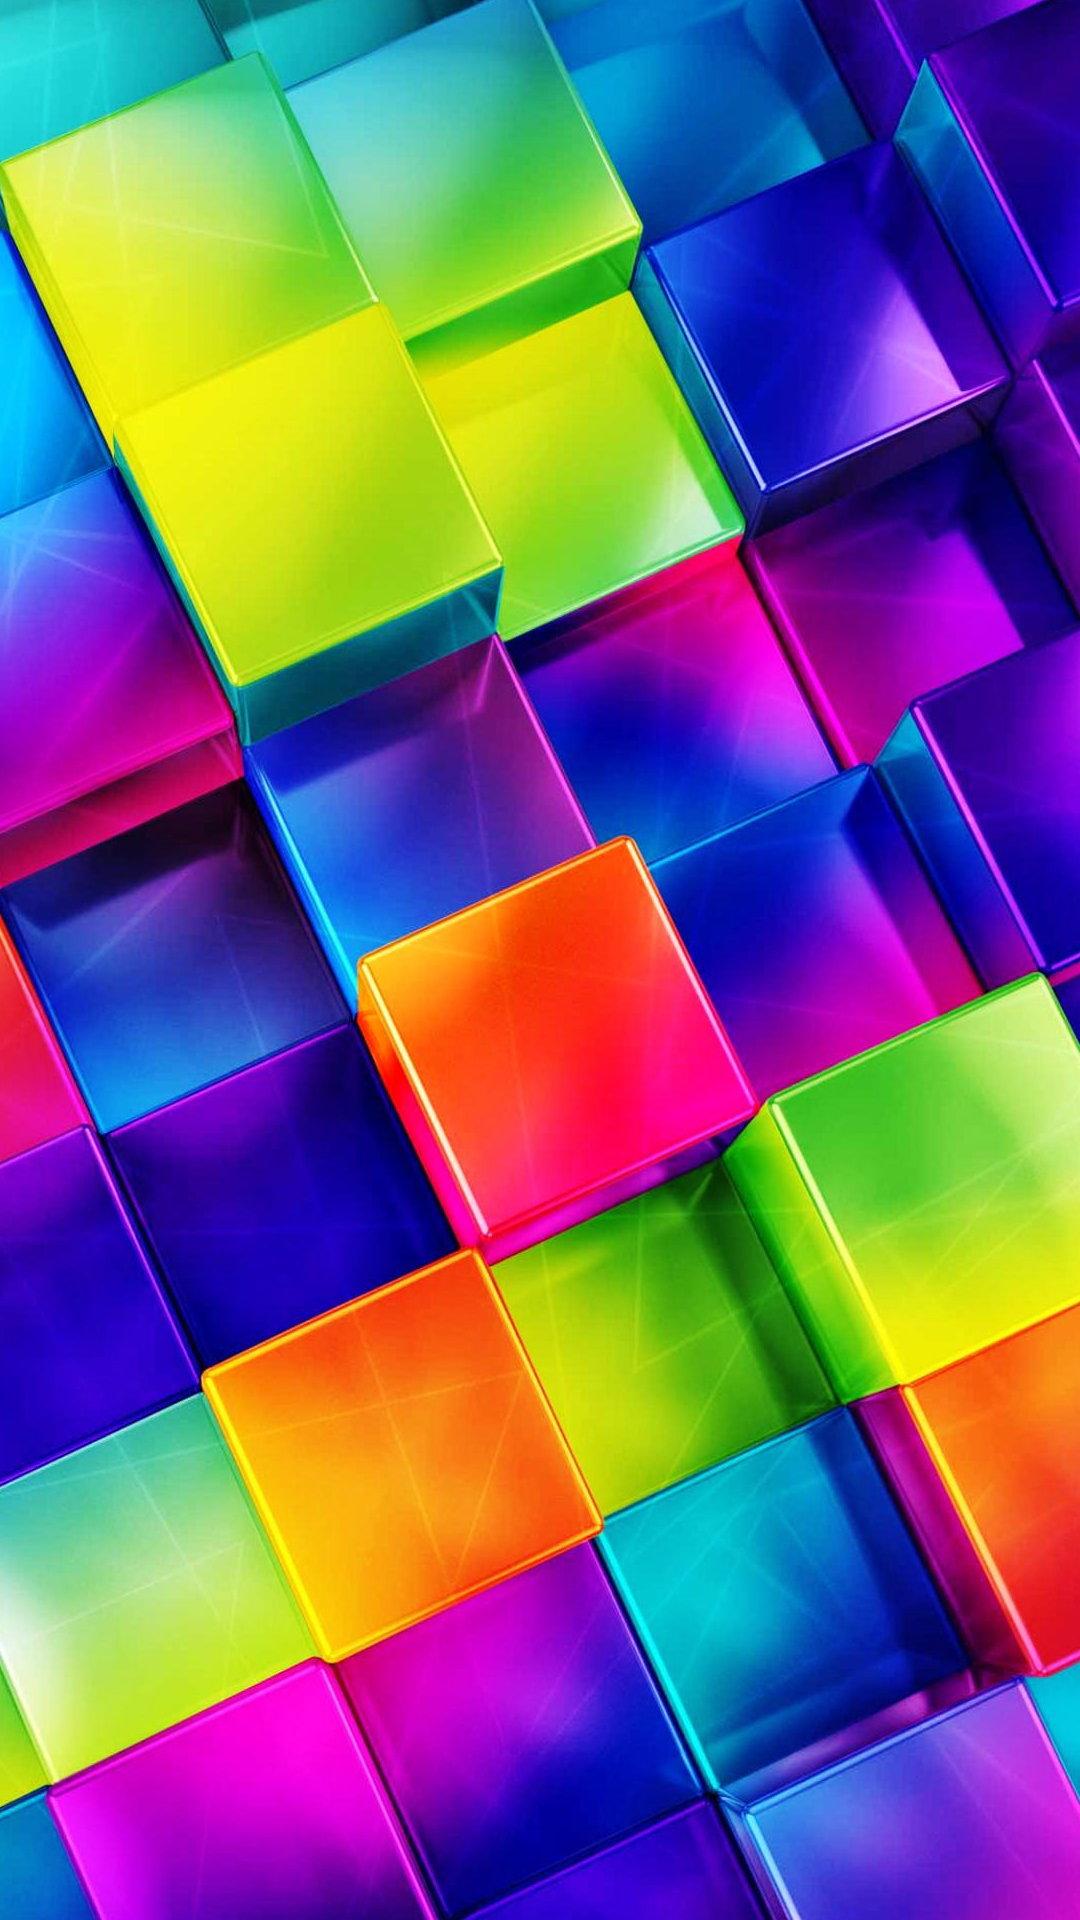 3d Wallpaper For Nexus 5 Wallpapers Samsung Galaxy S5 Pack 002